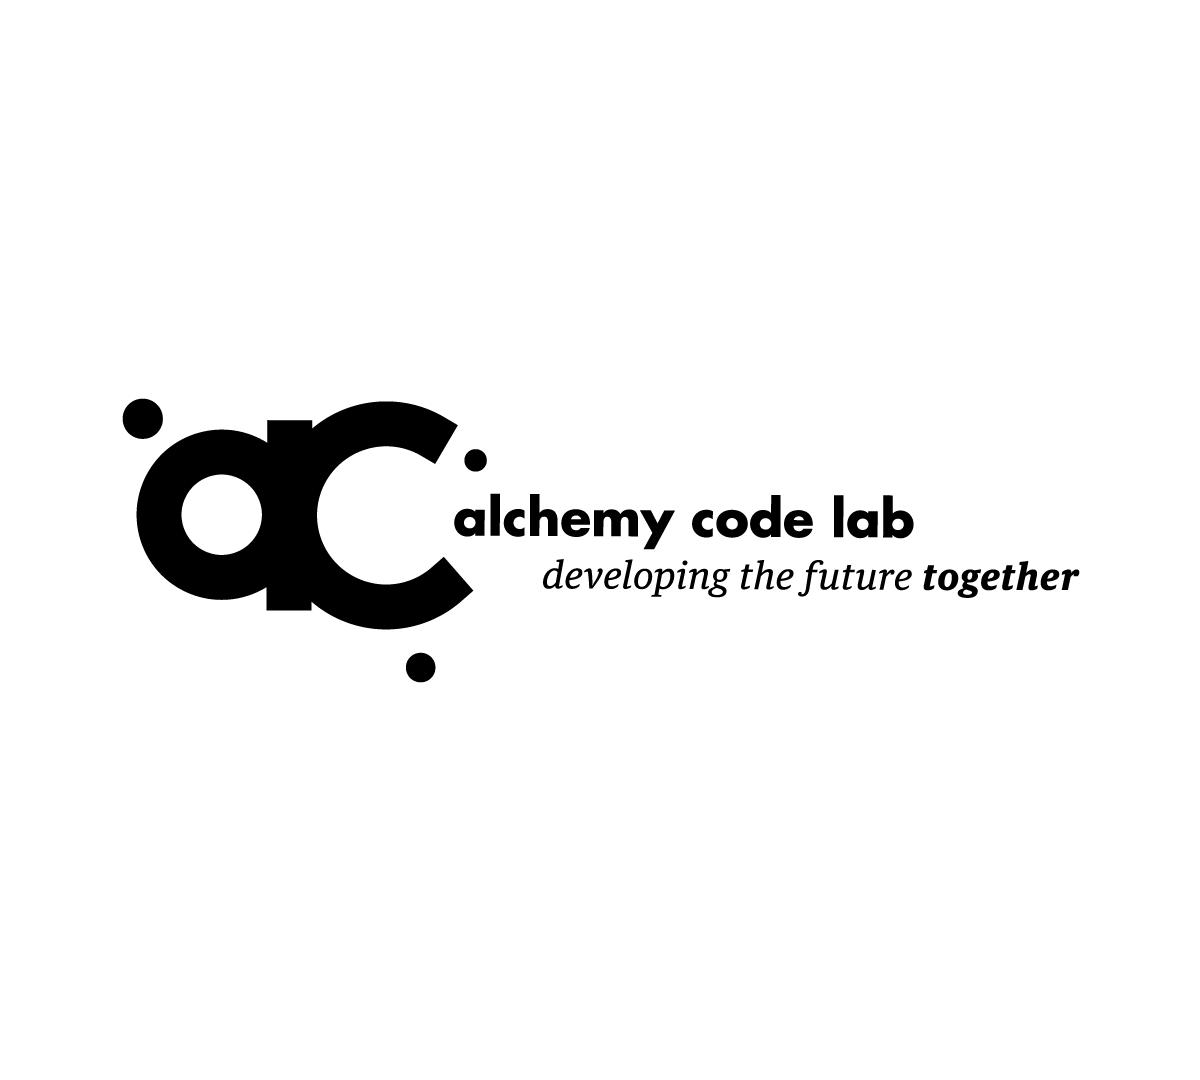 alchemy code lab